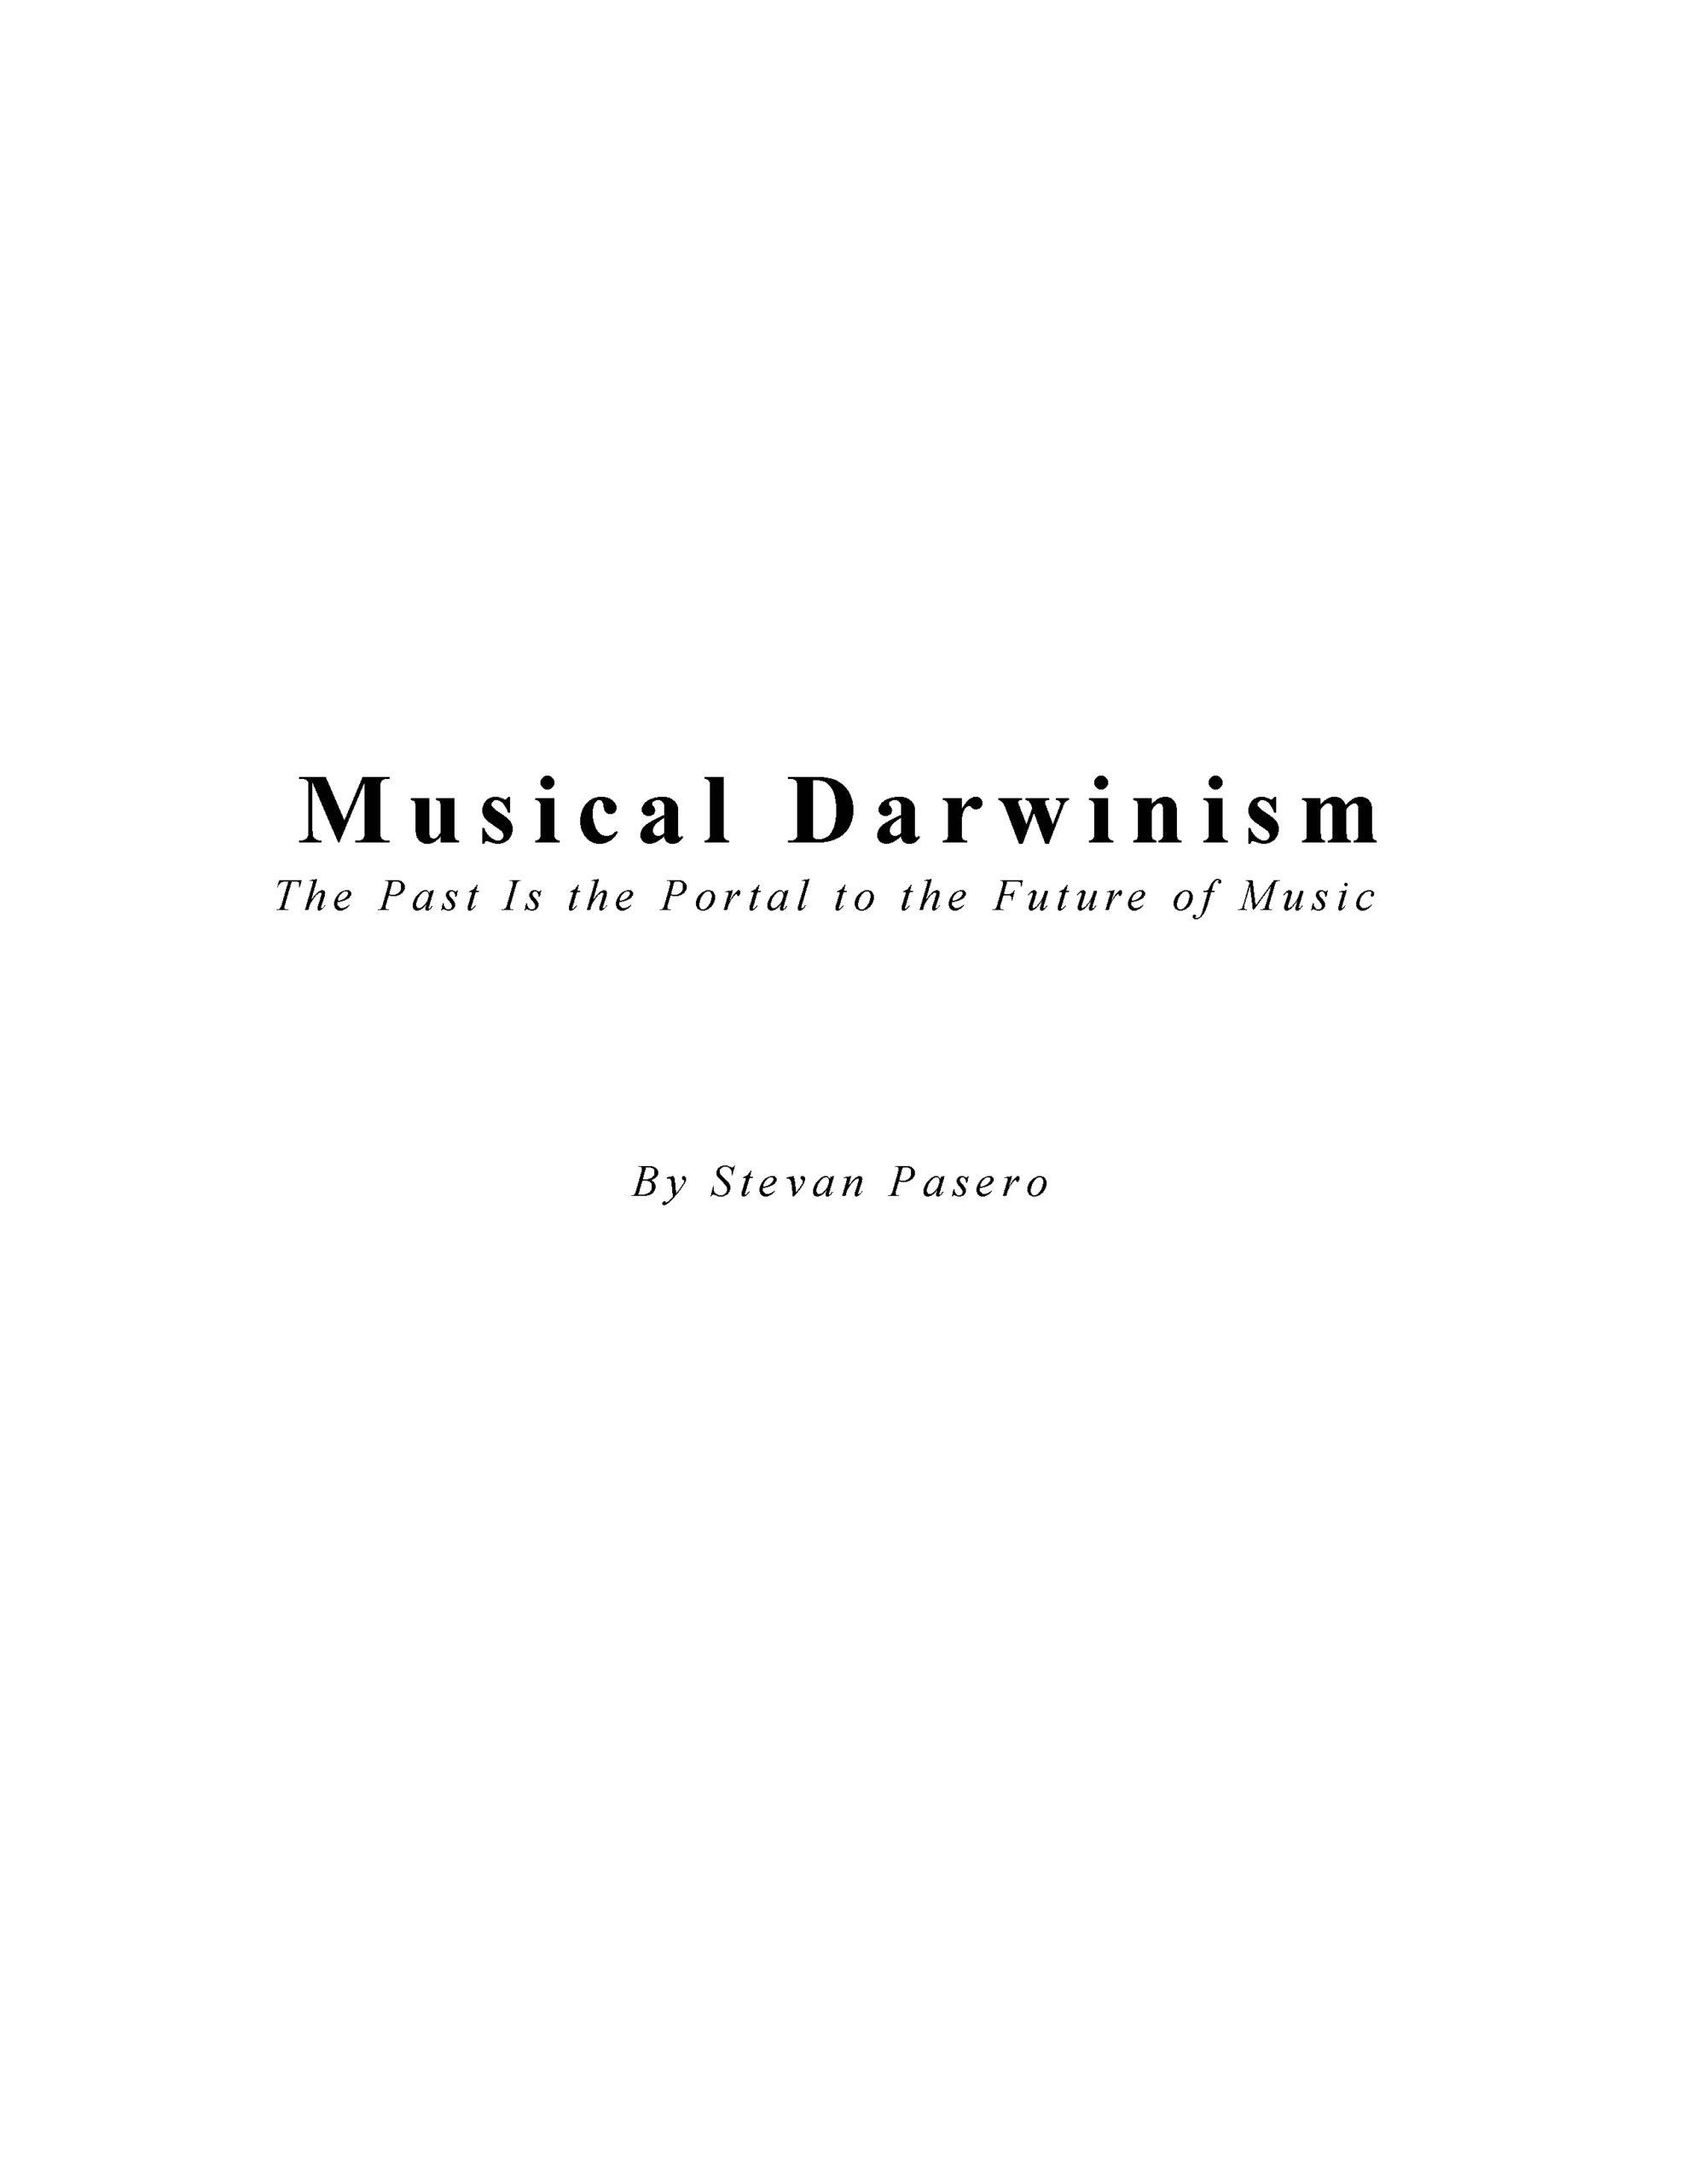 Musical Darwinism by Stevan Pasero